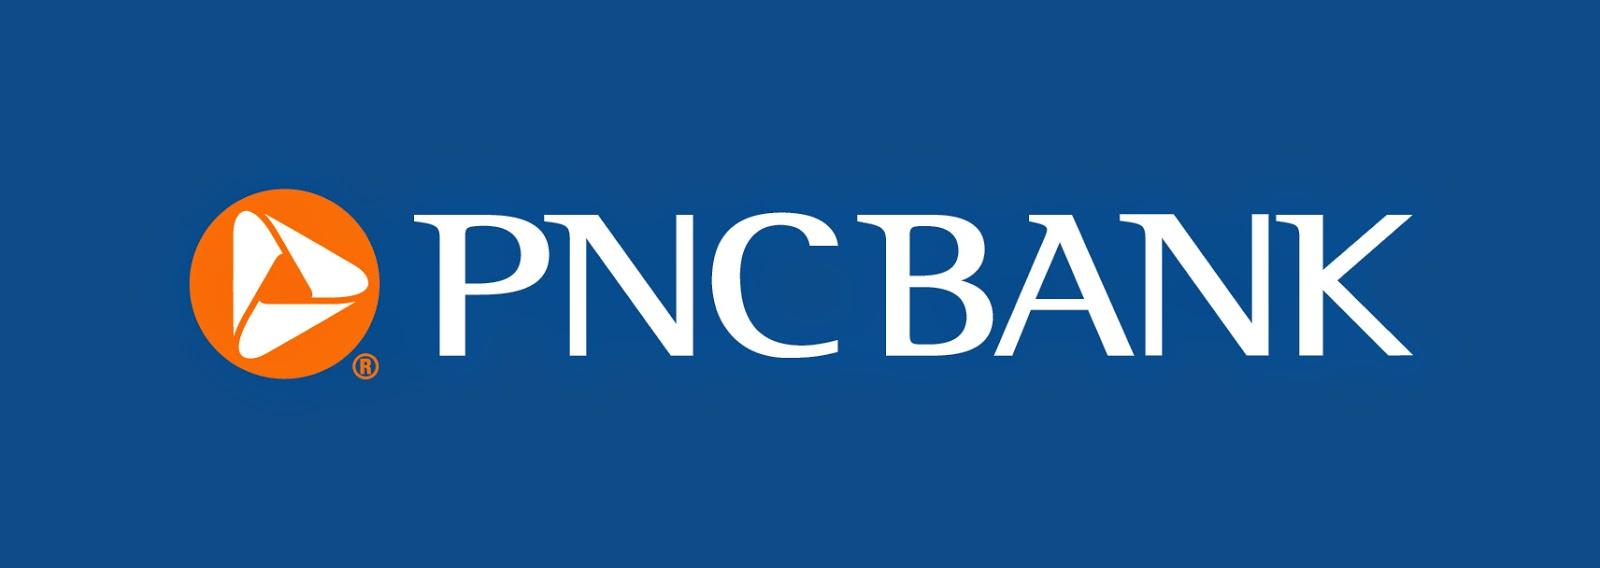 pnc bank vector logo